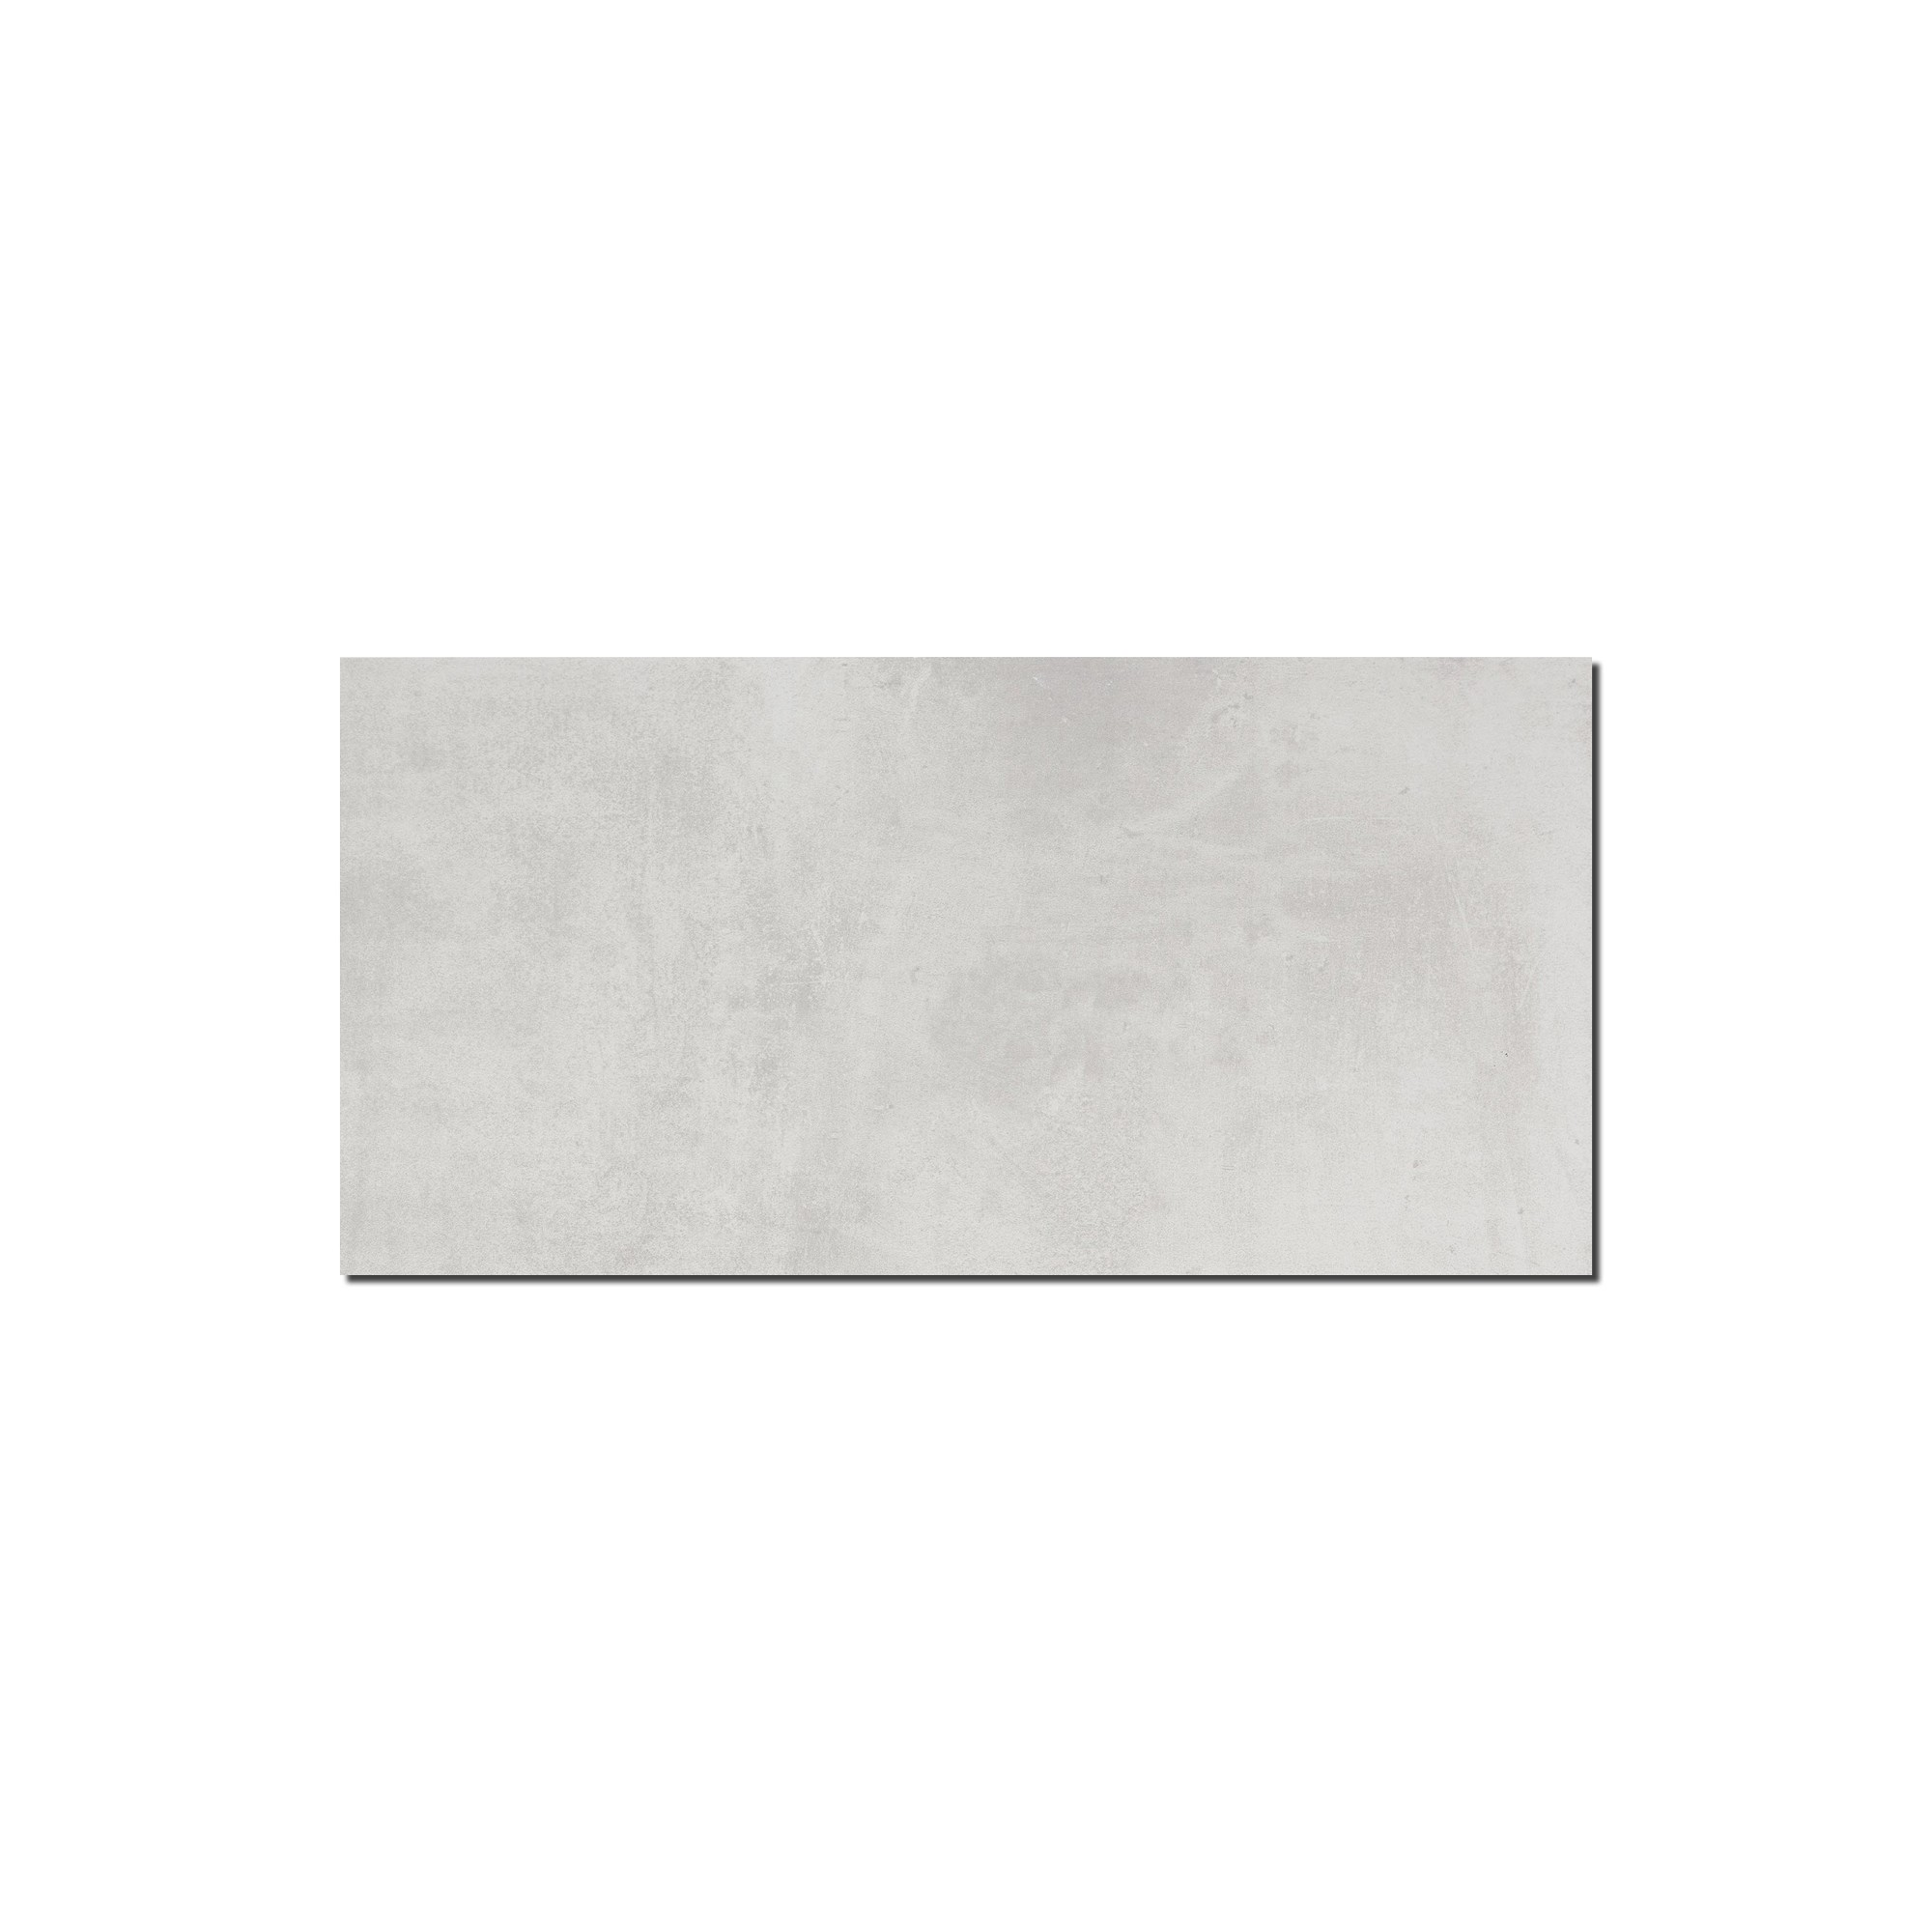 Carrelage sol et mur aspect béton Nice Bianco 30x60 cm